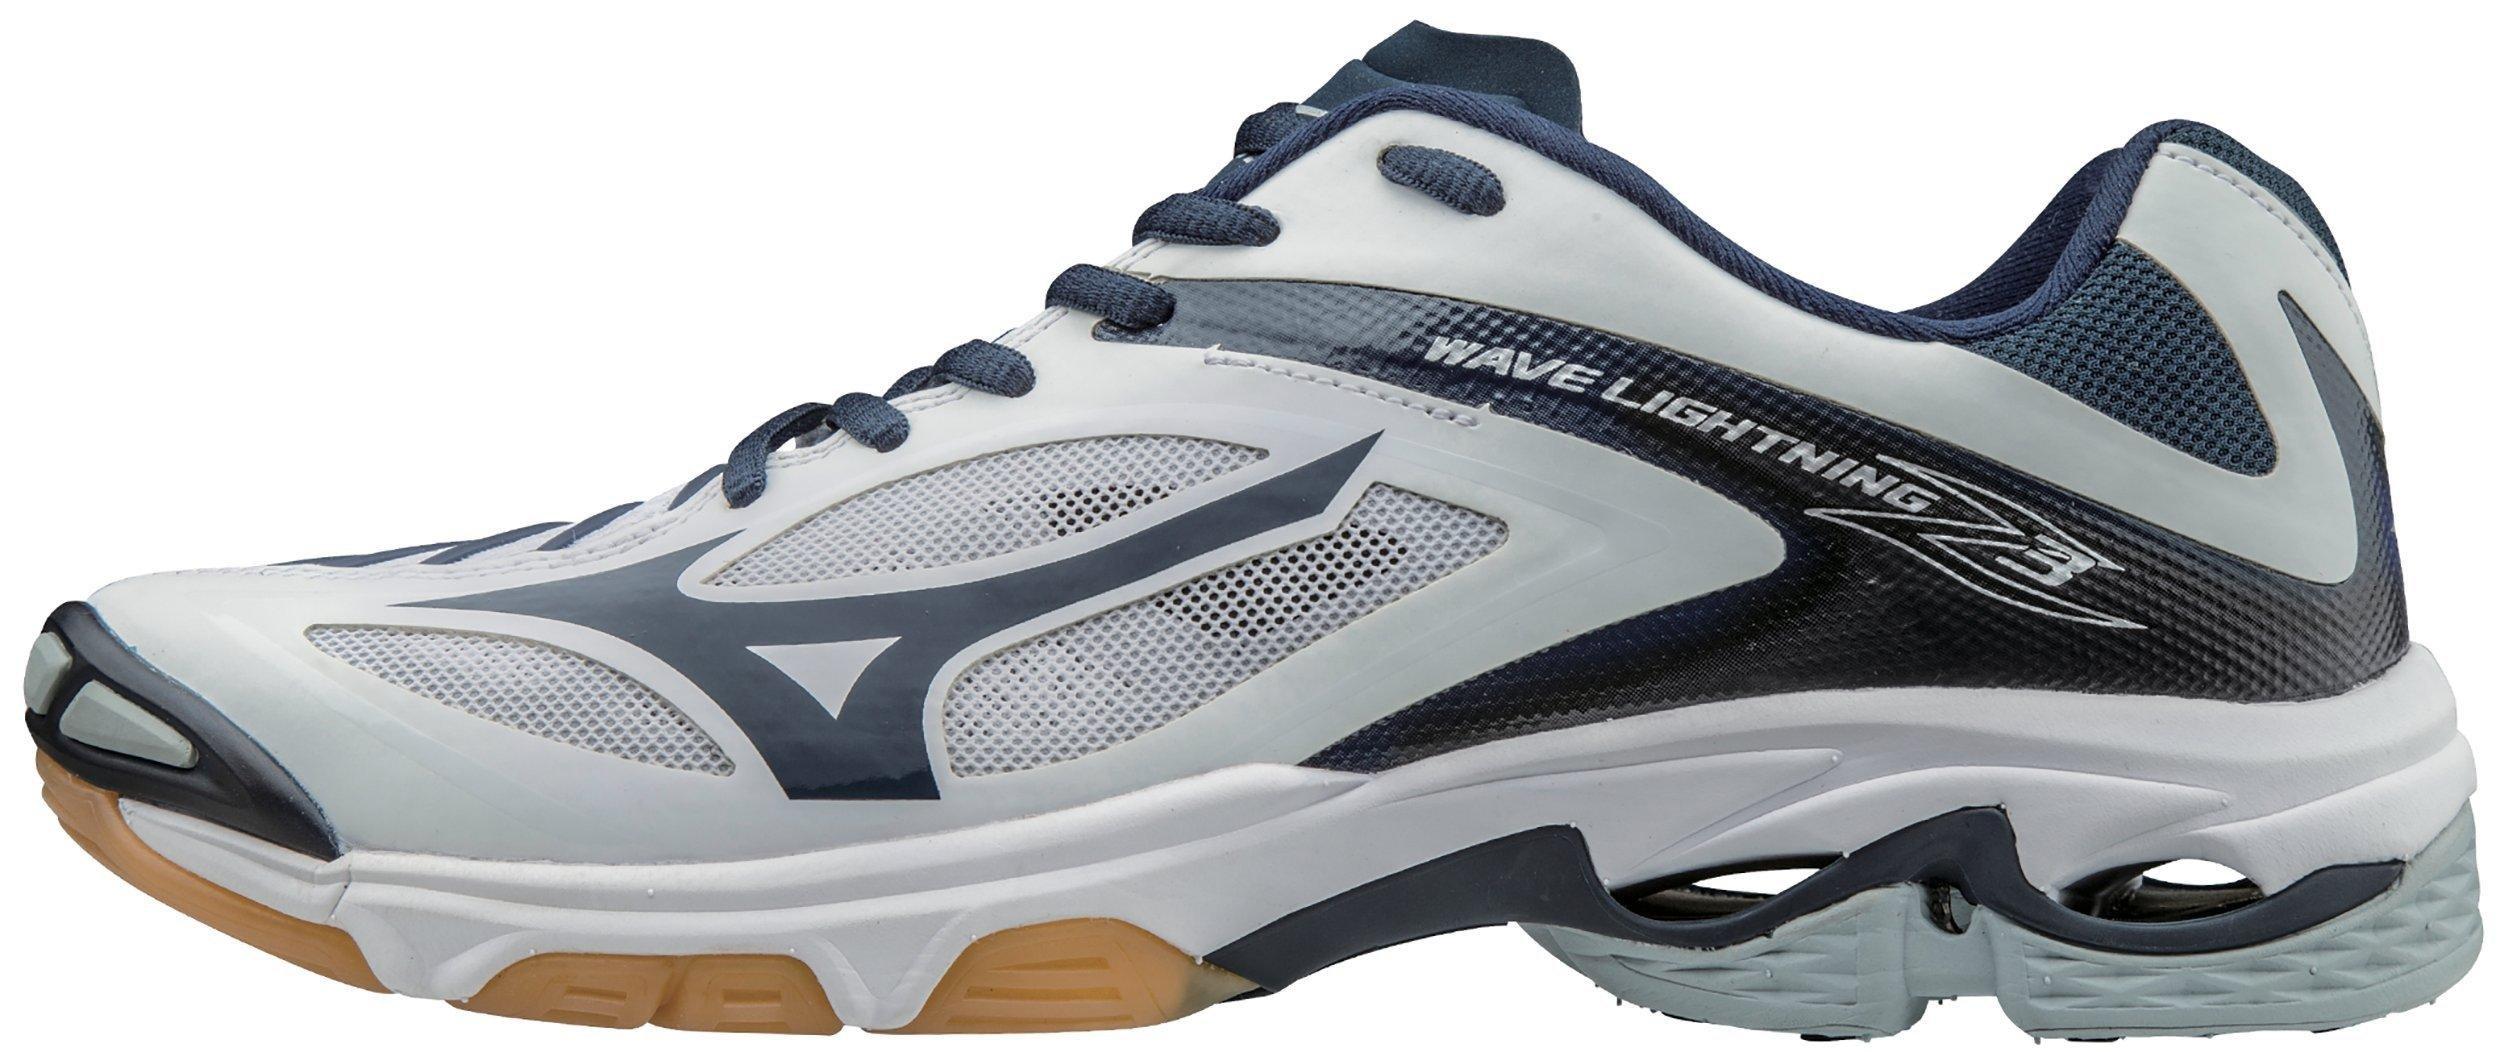 Mizuno Women's Wave Lighting Z3 Volleyball Shoe,White/Navy,9 B US